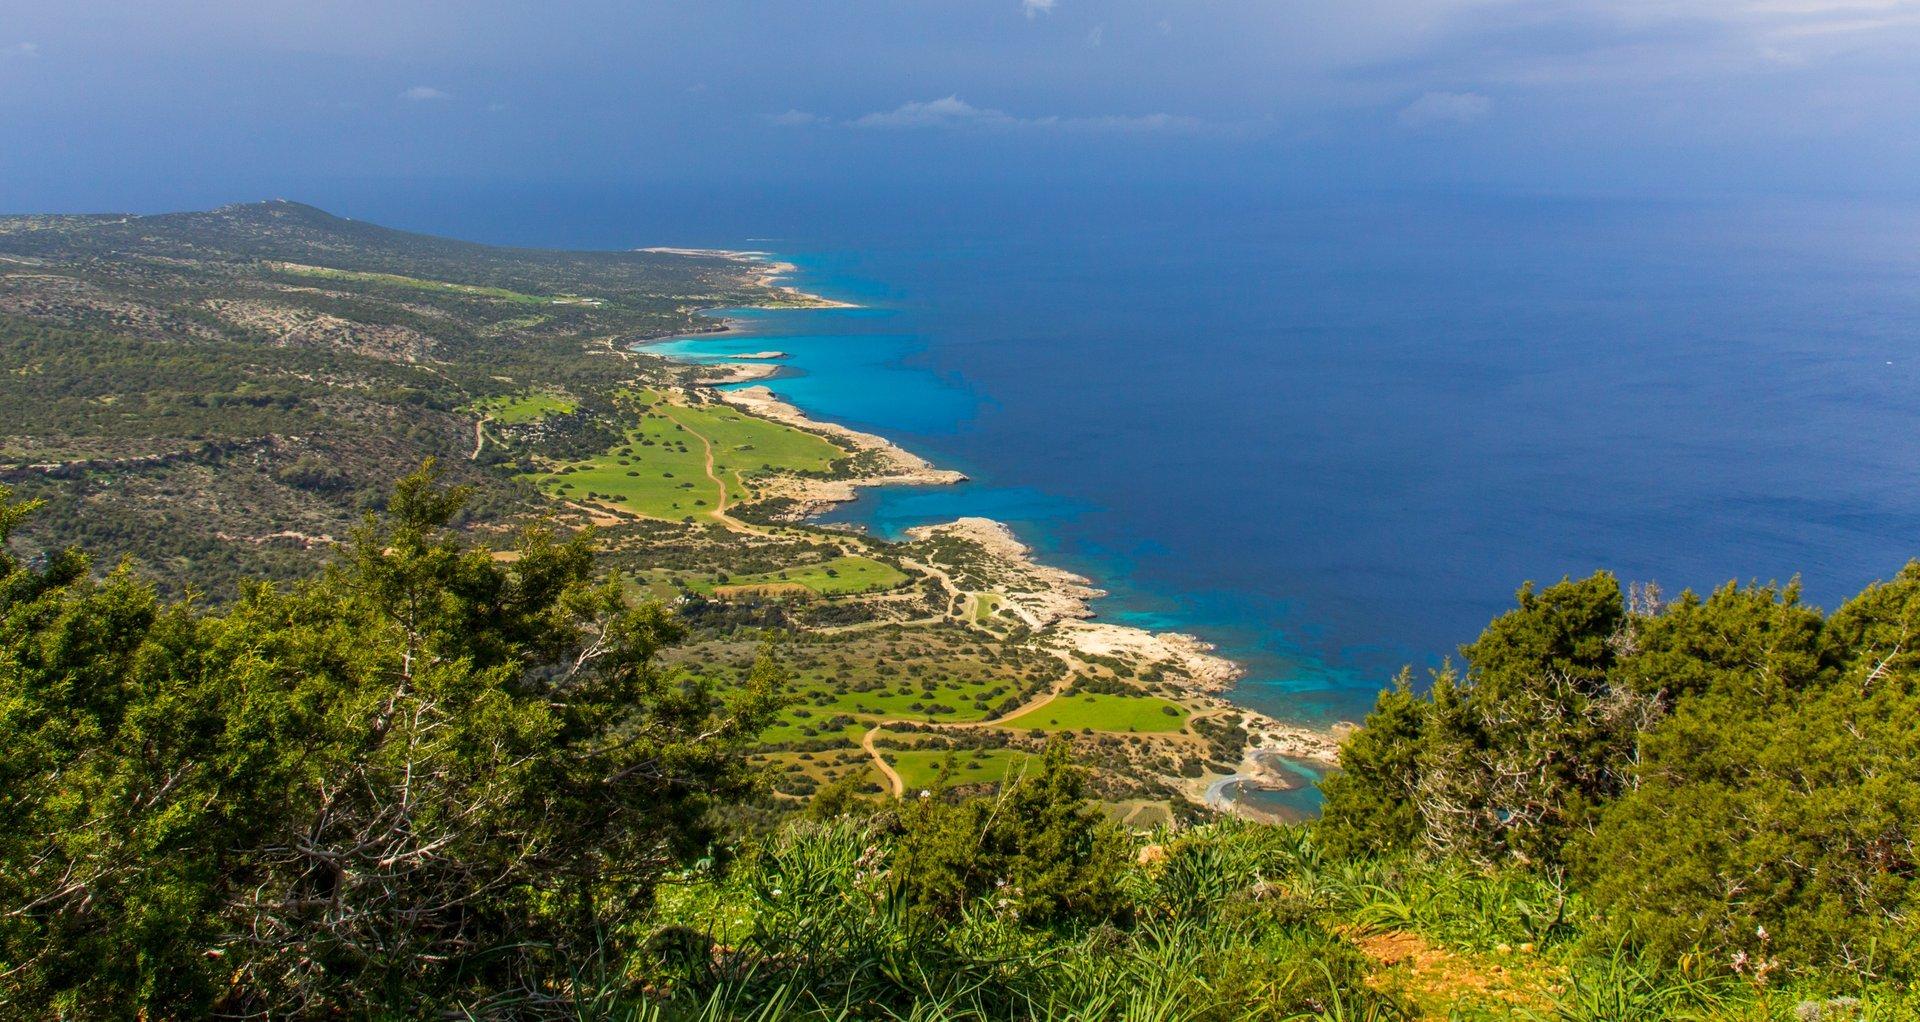 Aphrodite Trail Abloom in Cyprus - Best Season